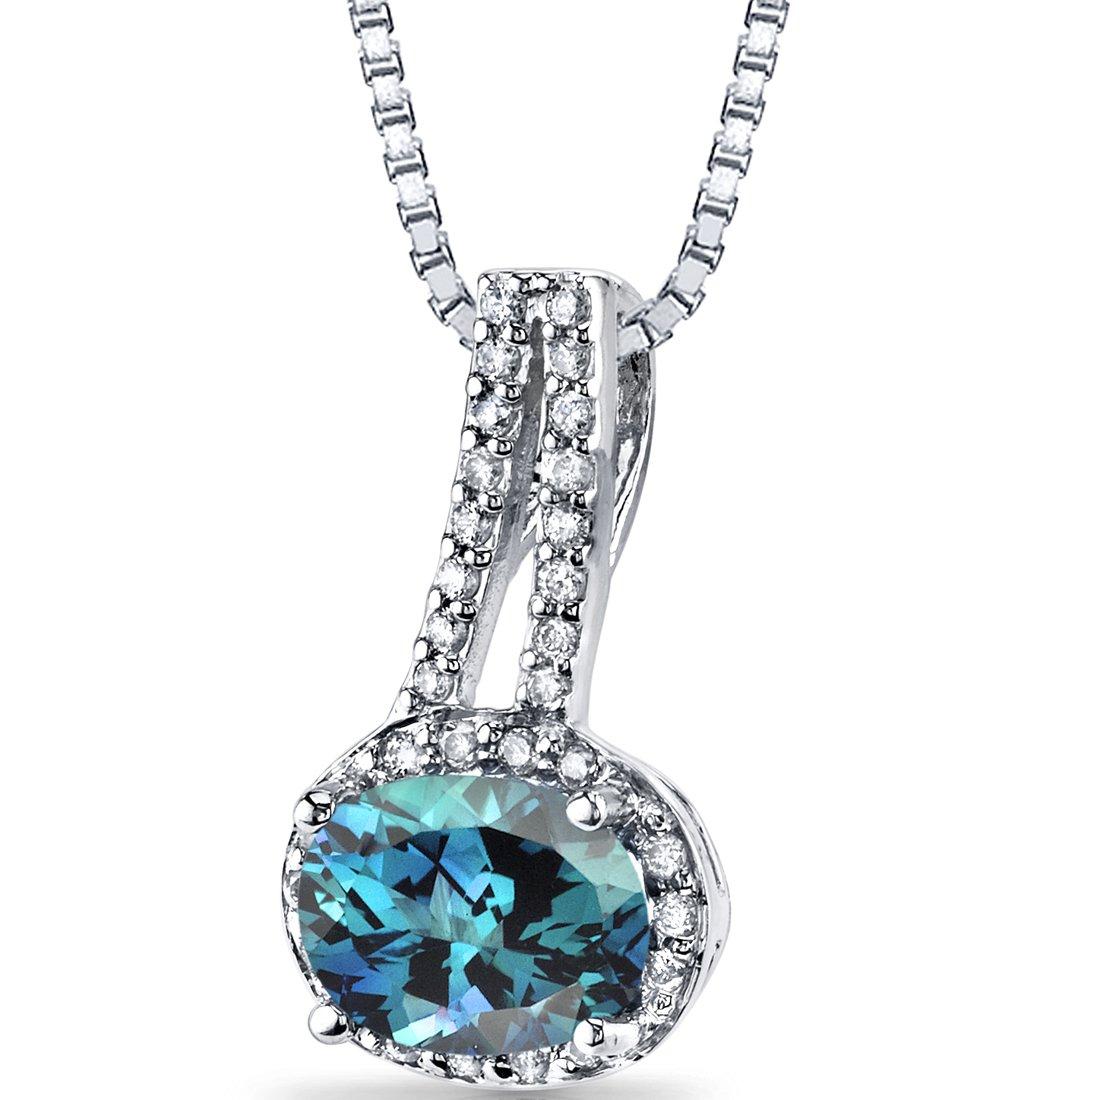 14K White Gold Created Alexandrite Diamond Pendant Oval Cut 1.5 Carats Total